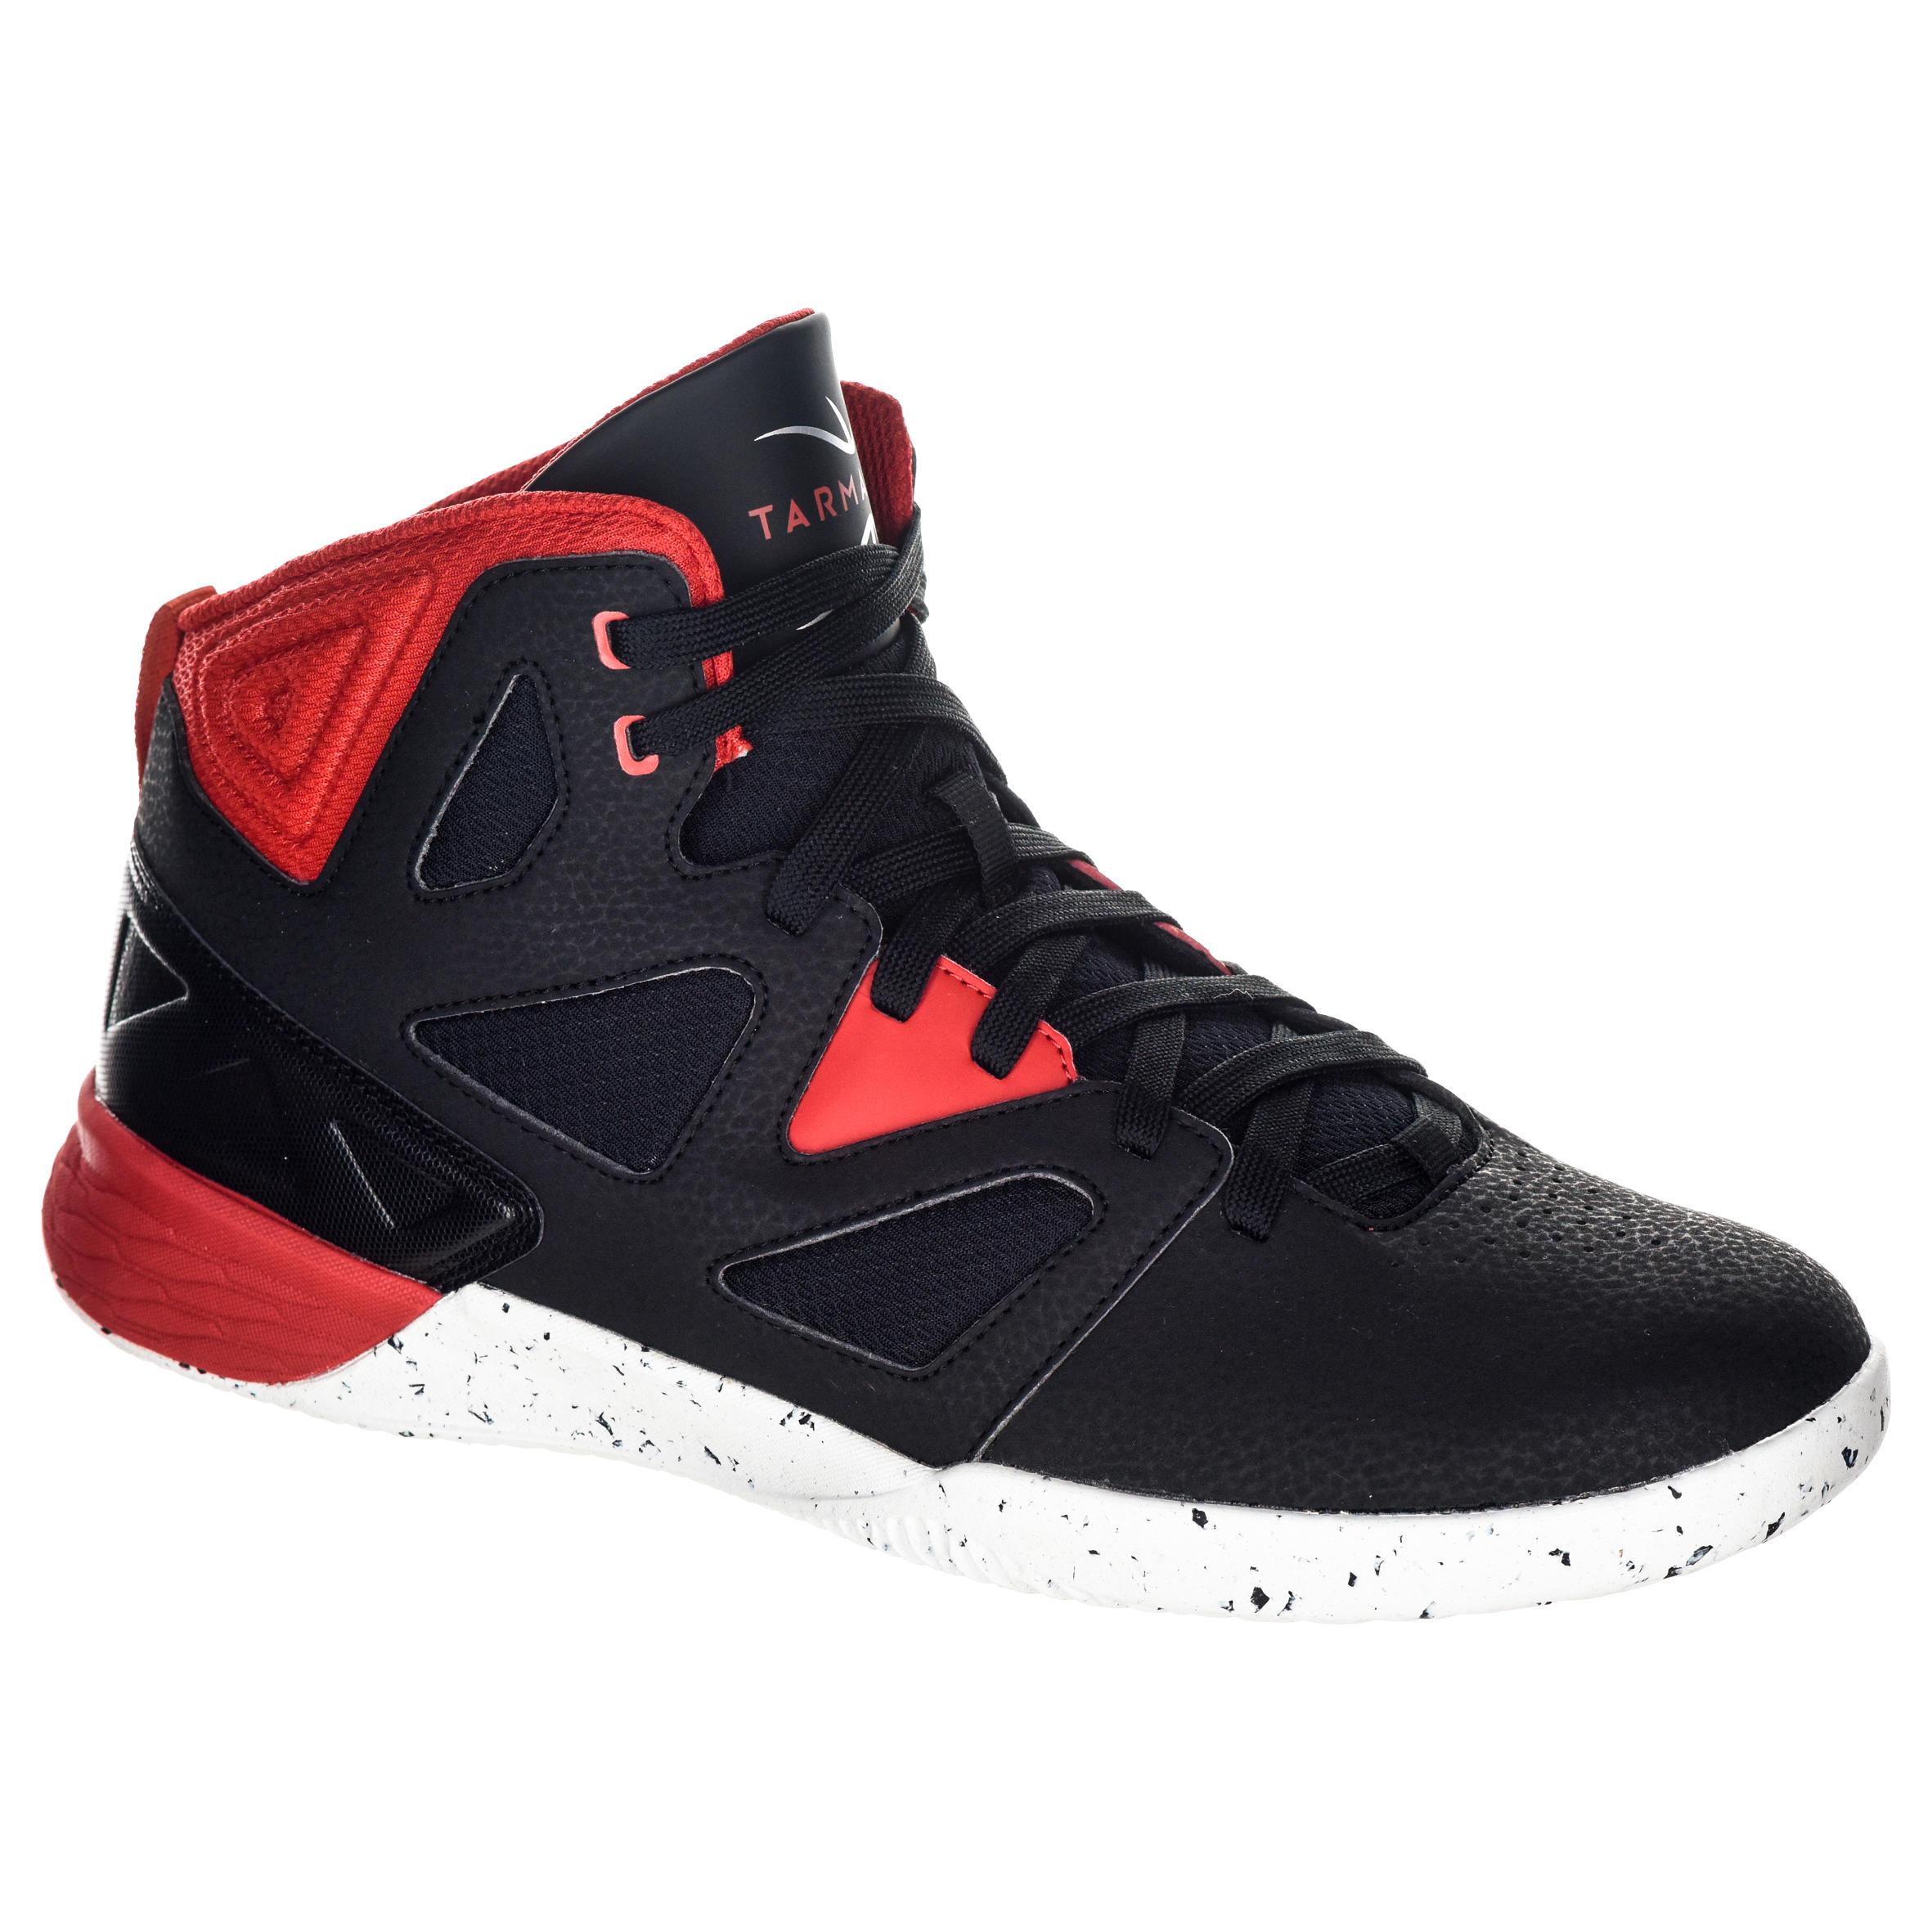 Tarmak Basketbalschoenen Shield 300 zwart/wit/rood